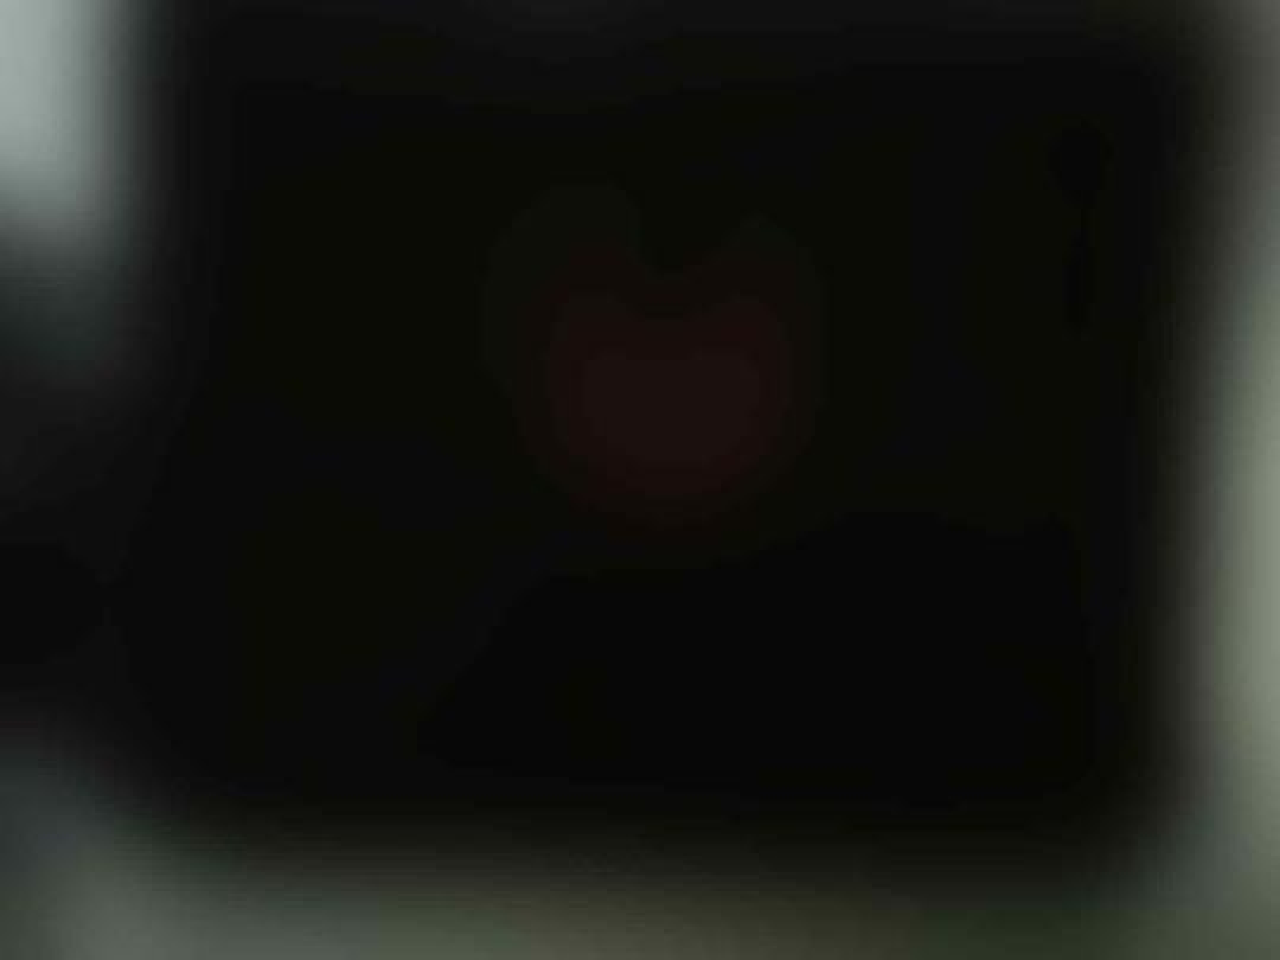 dijual Laptop Dell Inspiron N4030